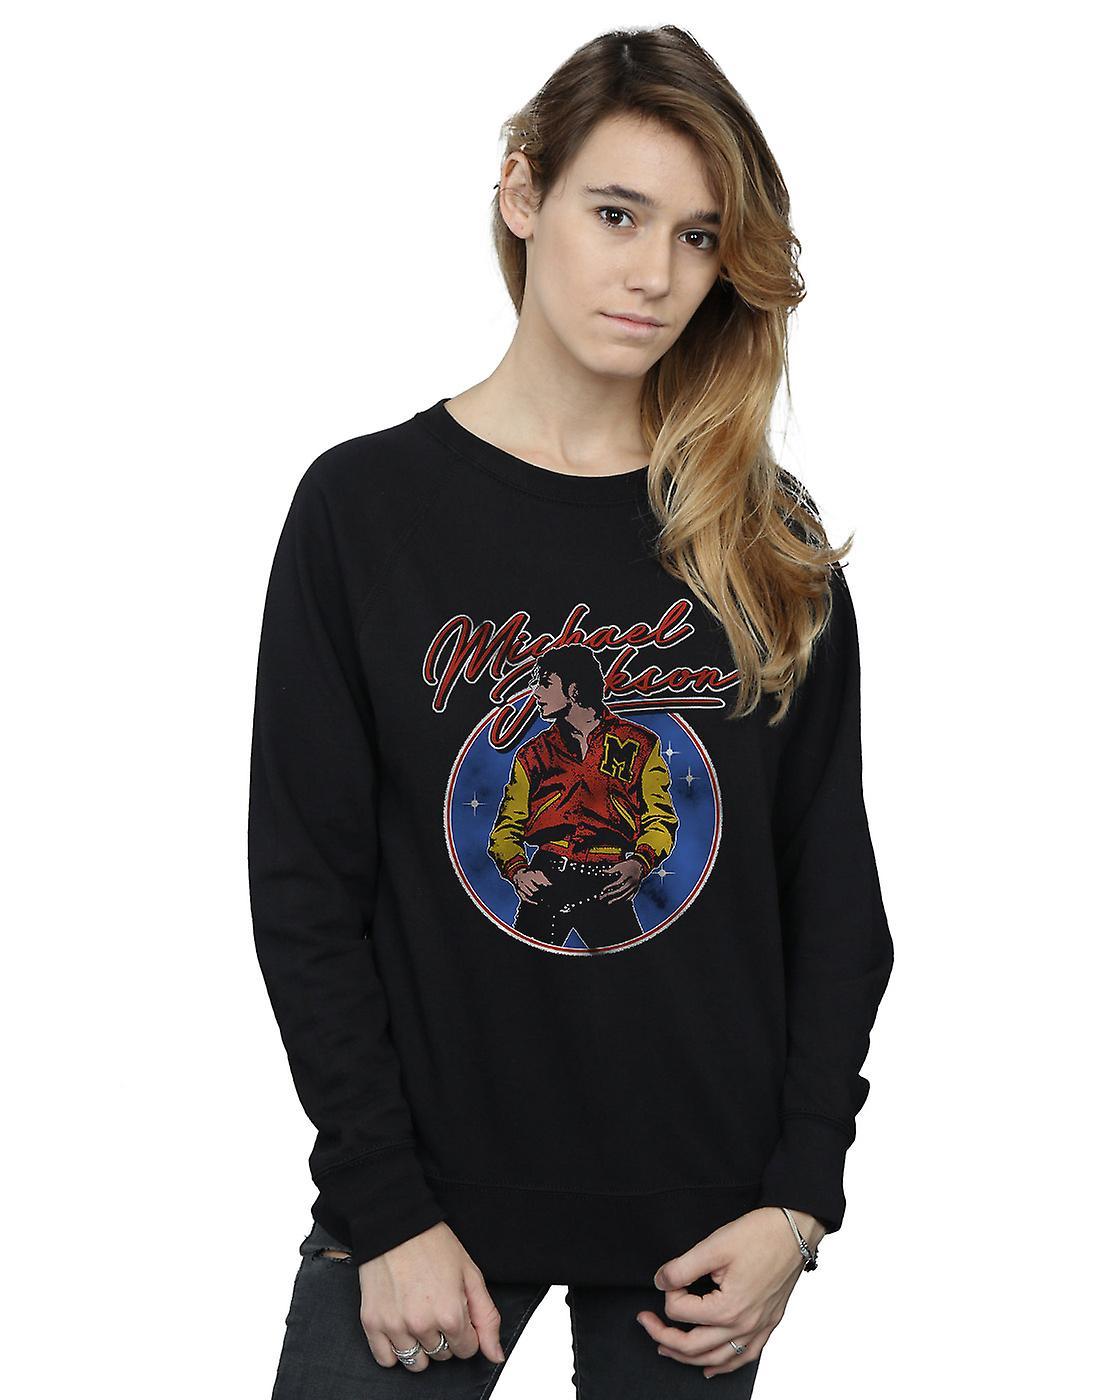 Michael Jackson Women's Circle Thriller Crest Sweatshirt